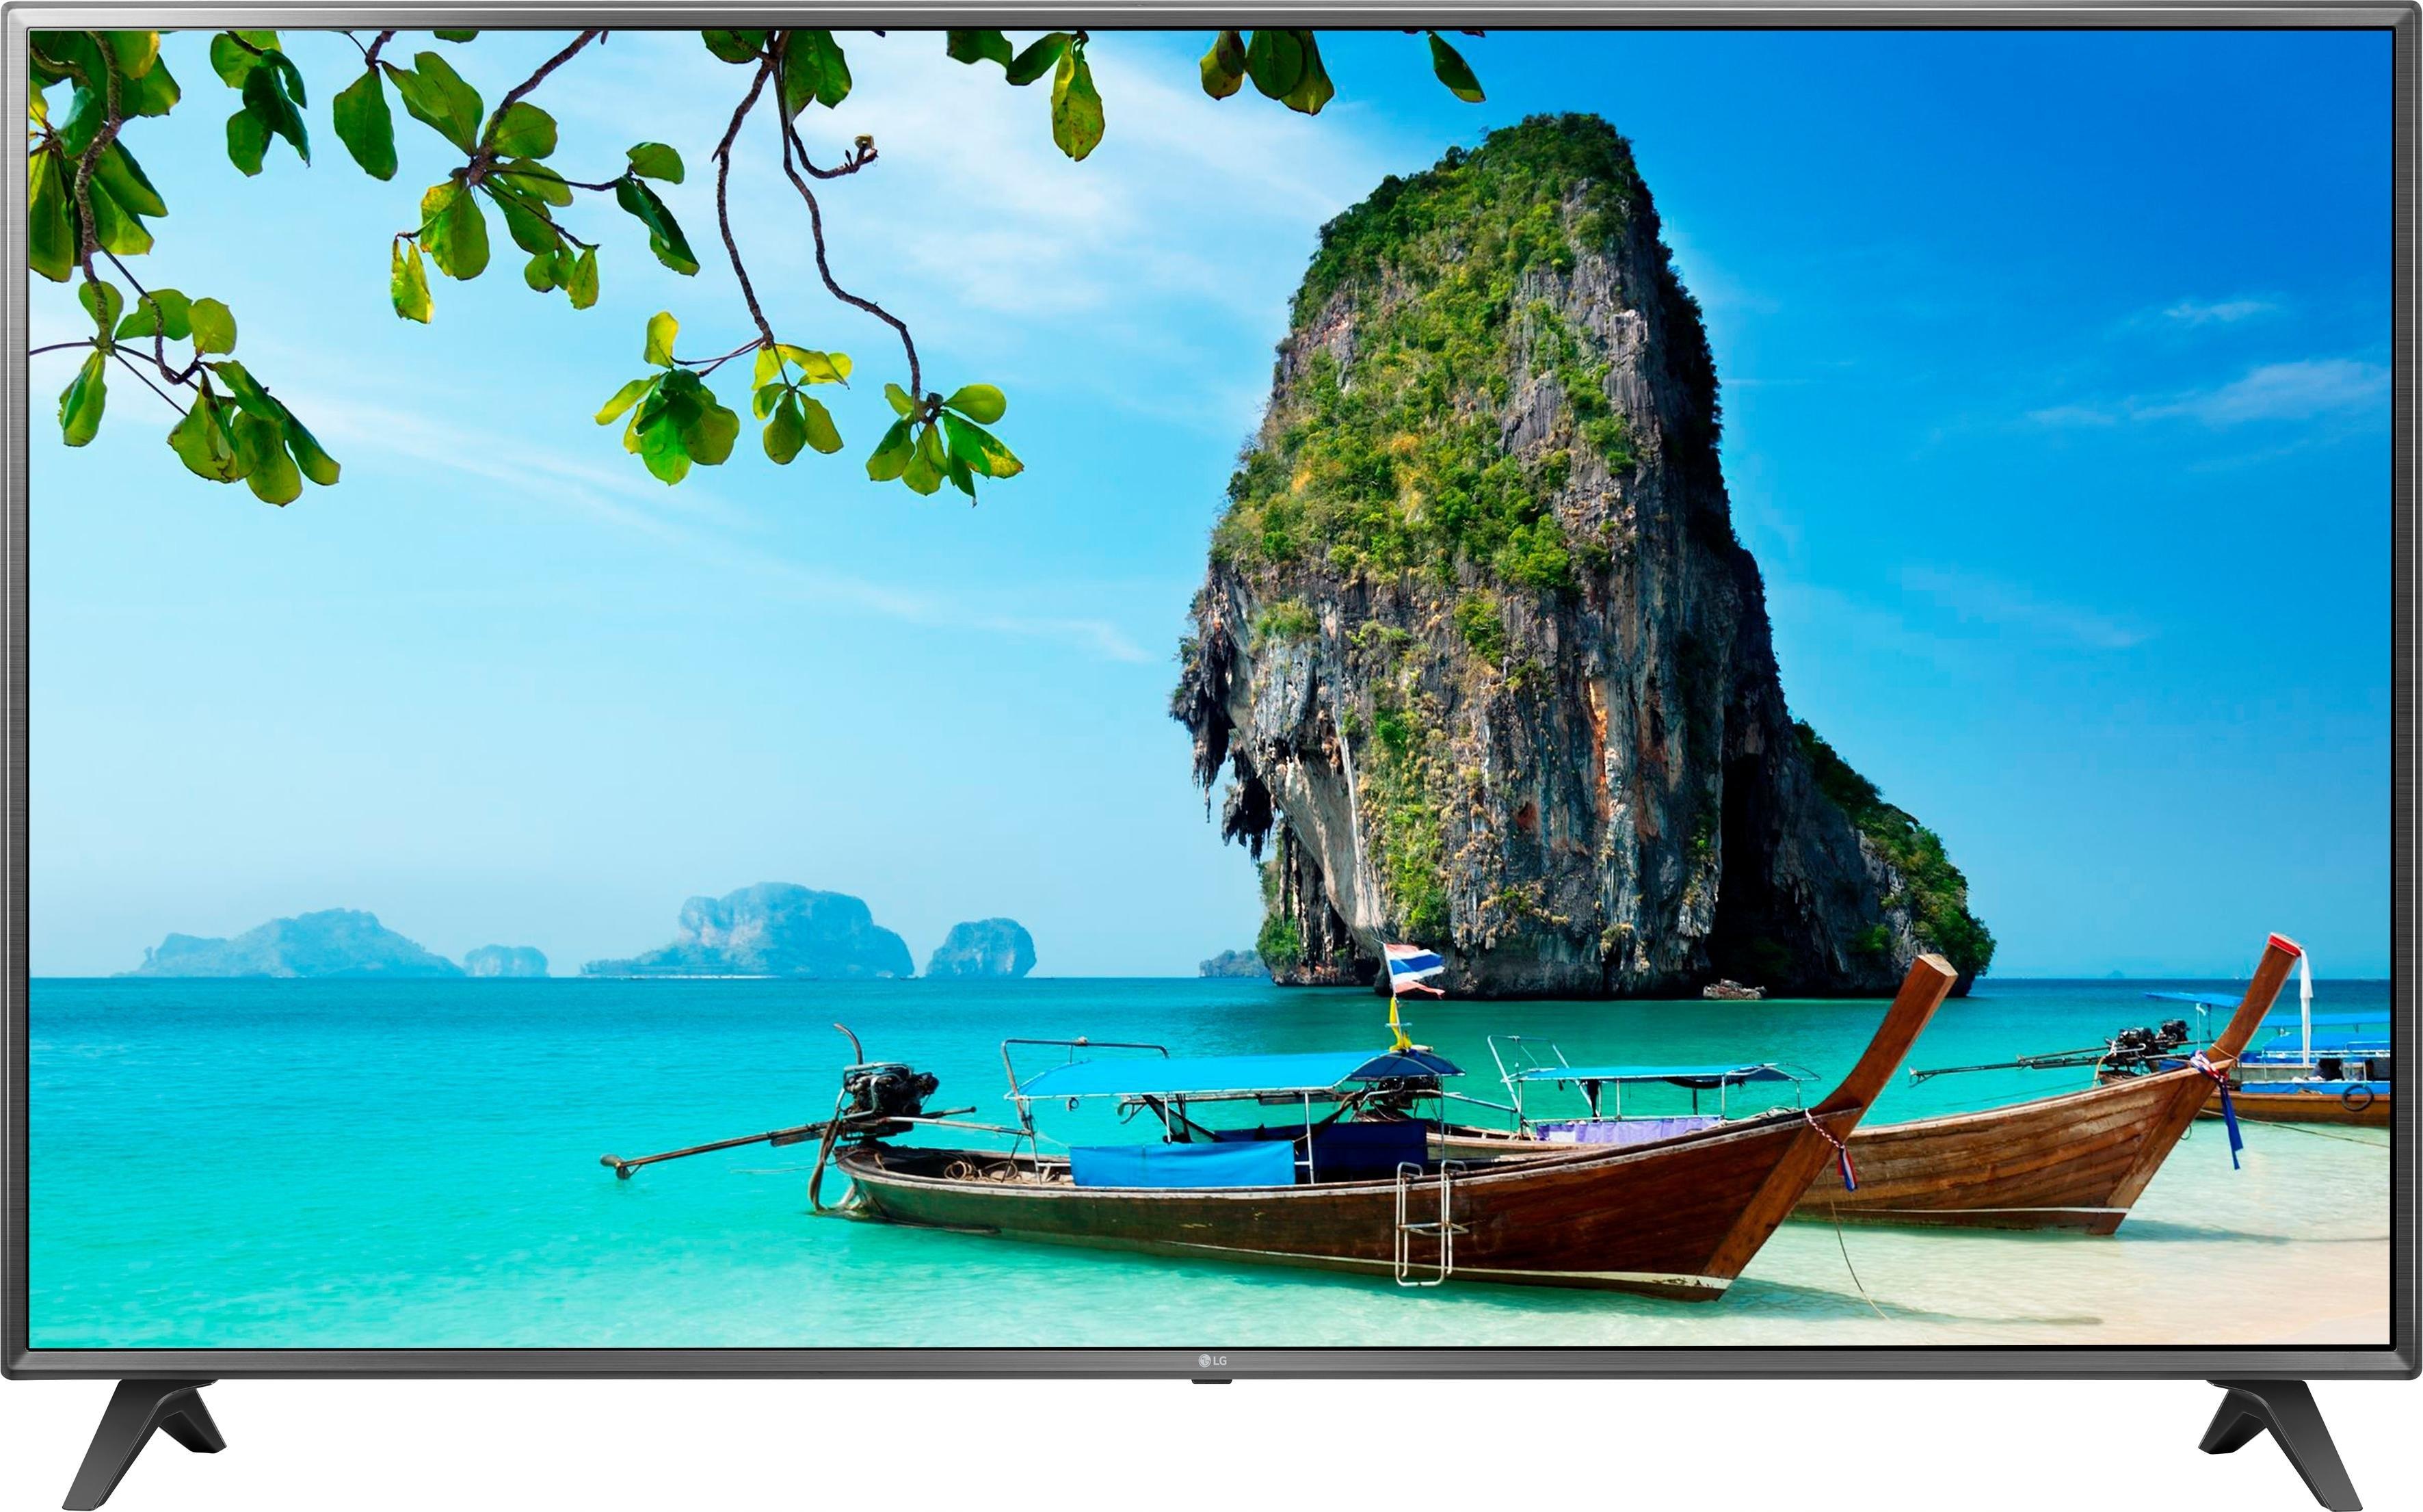 LG 75UM7110PLB lcd-led-tv (189 cm / 75 inch), 4K Ultra HD, Smart-TV nu online bestellen